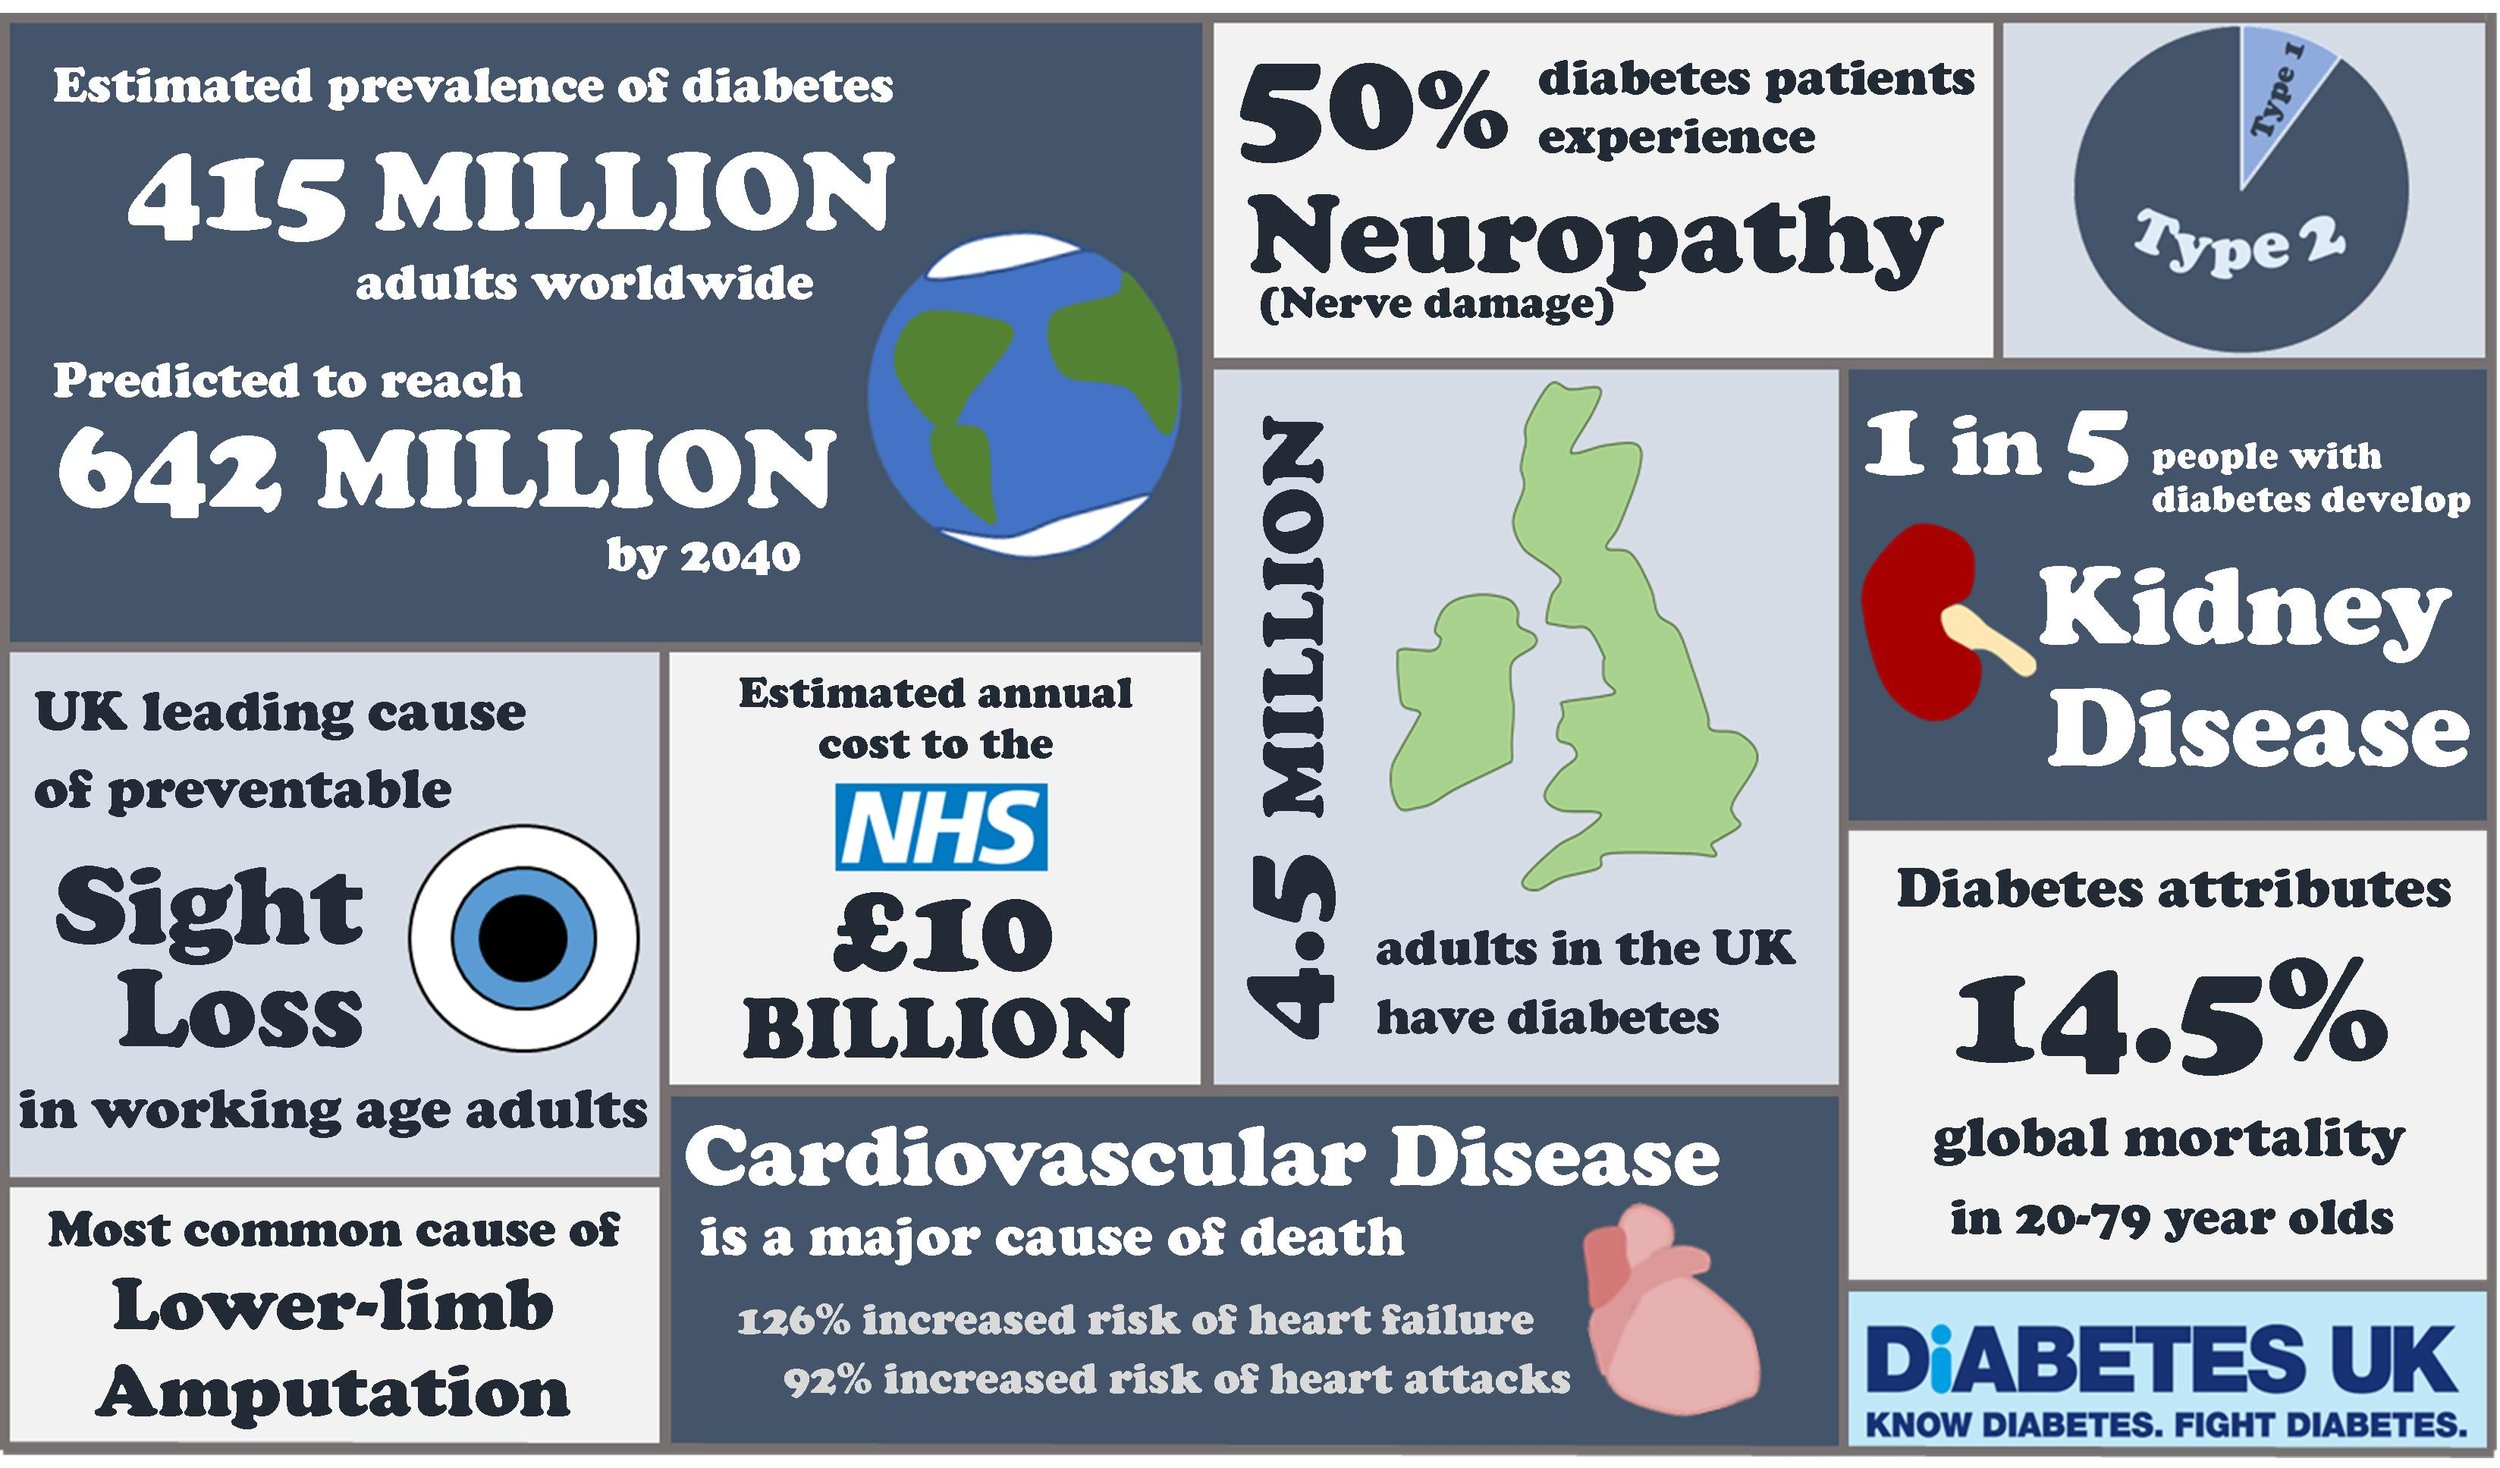 Diabetes infographic 300dpi.jpg